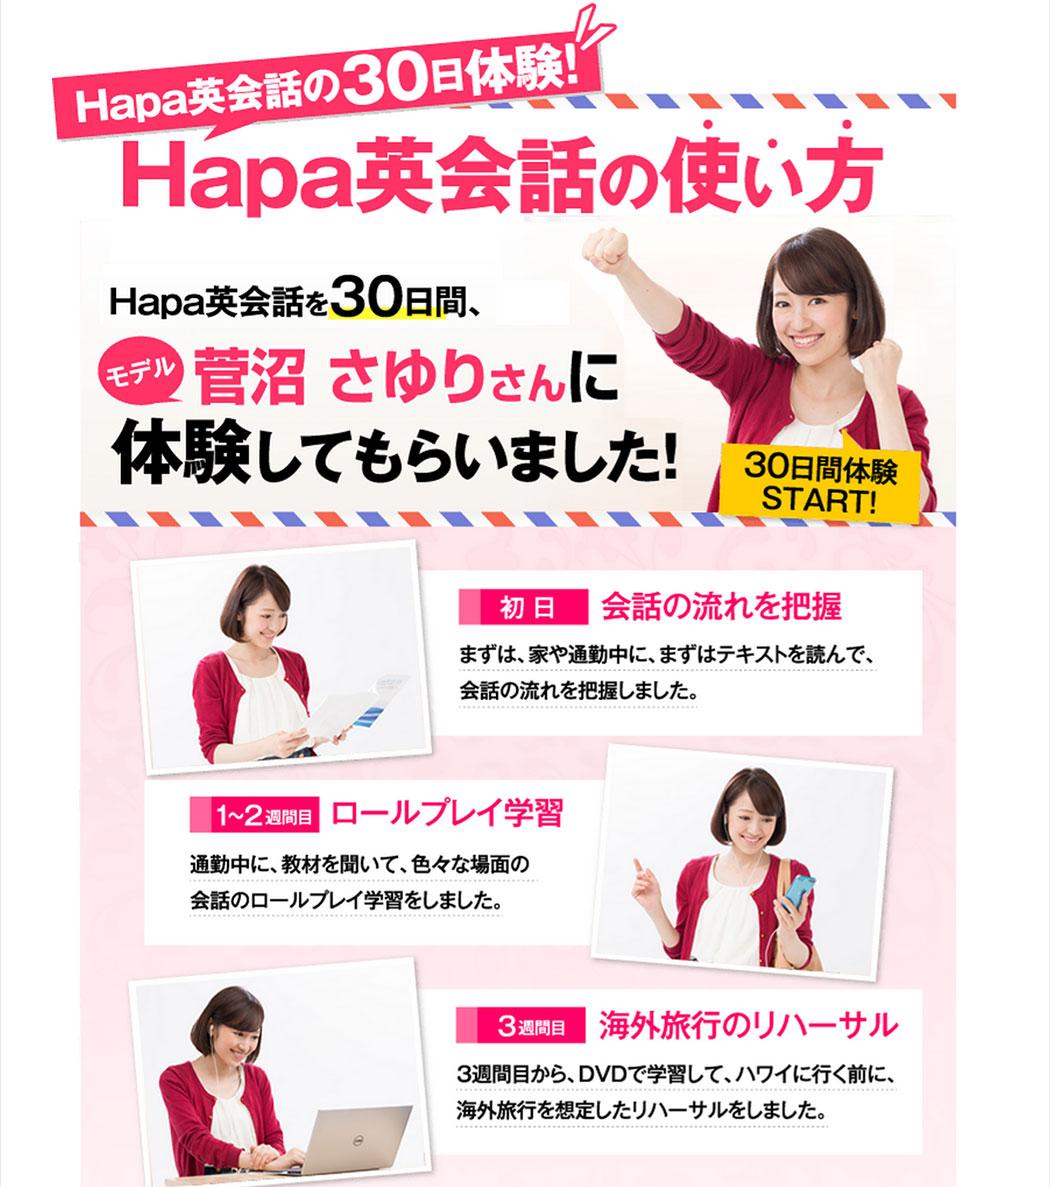 hapa-new-lp27.jpg